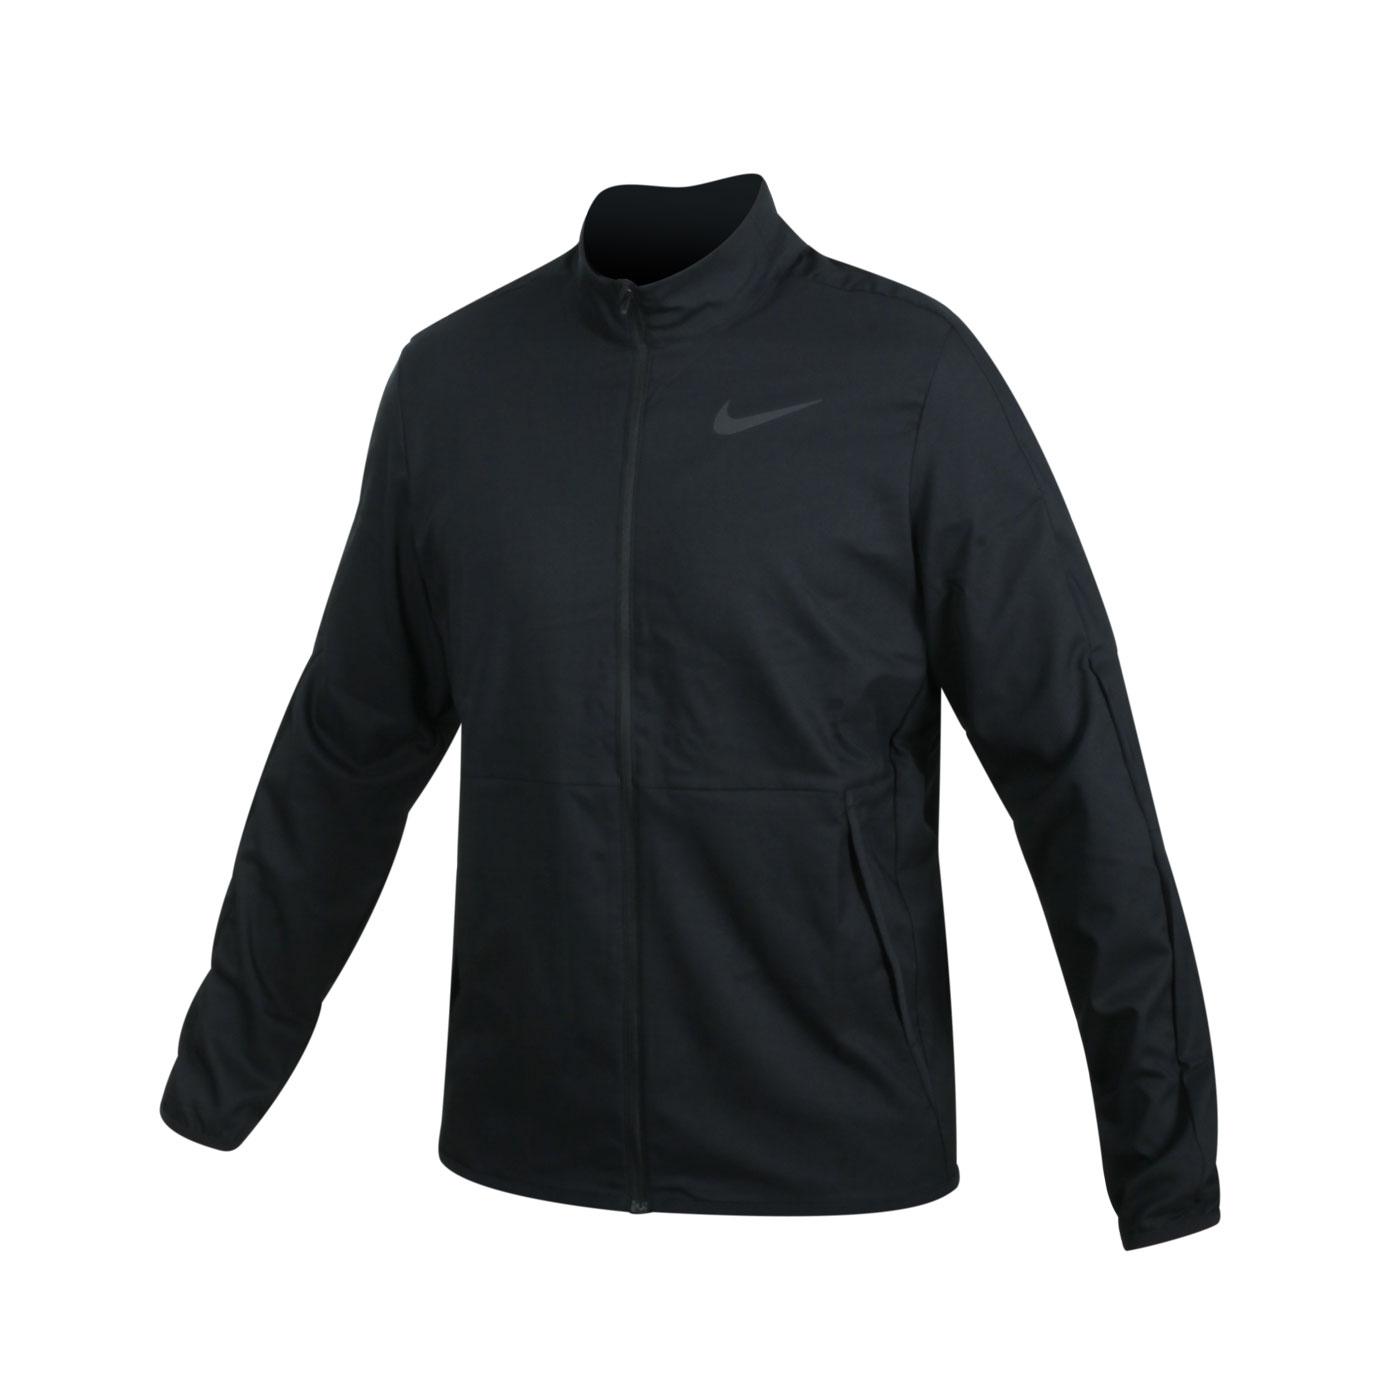 NIKE 男款吸濕排汗訓練外套 CU4954-010 - 黑灰